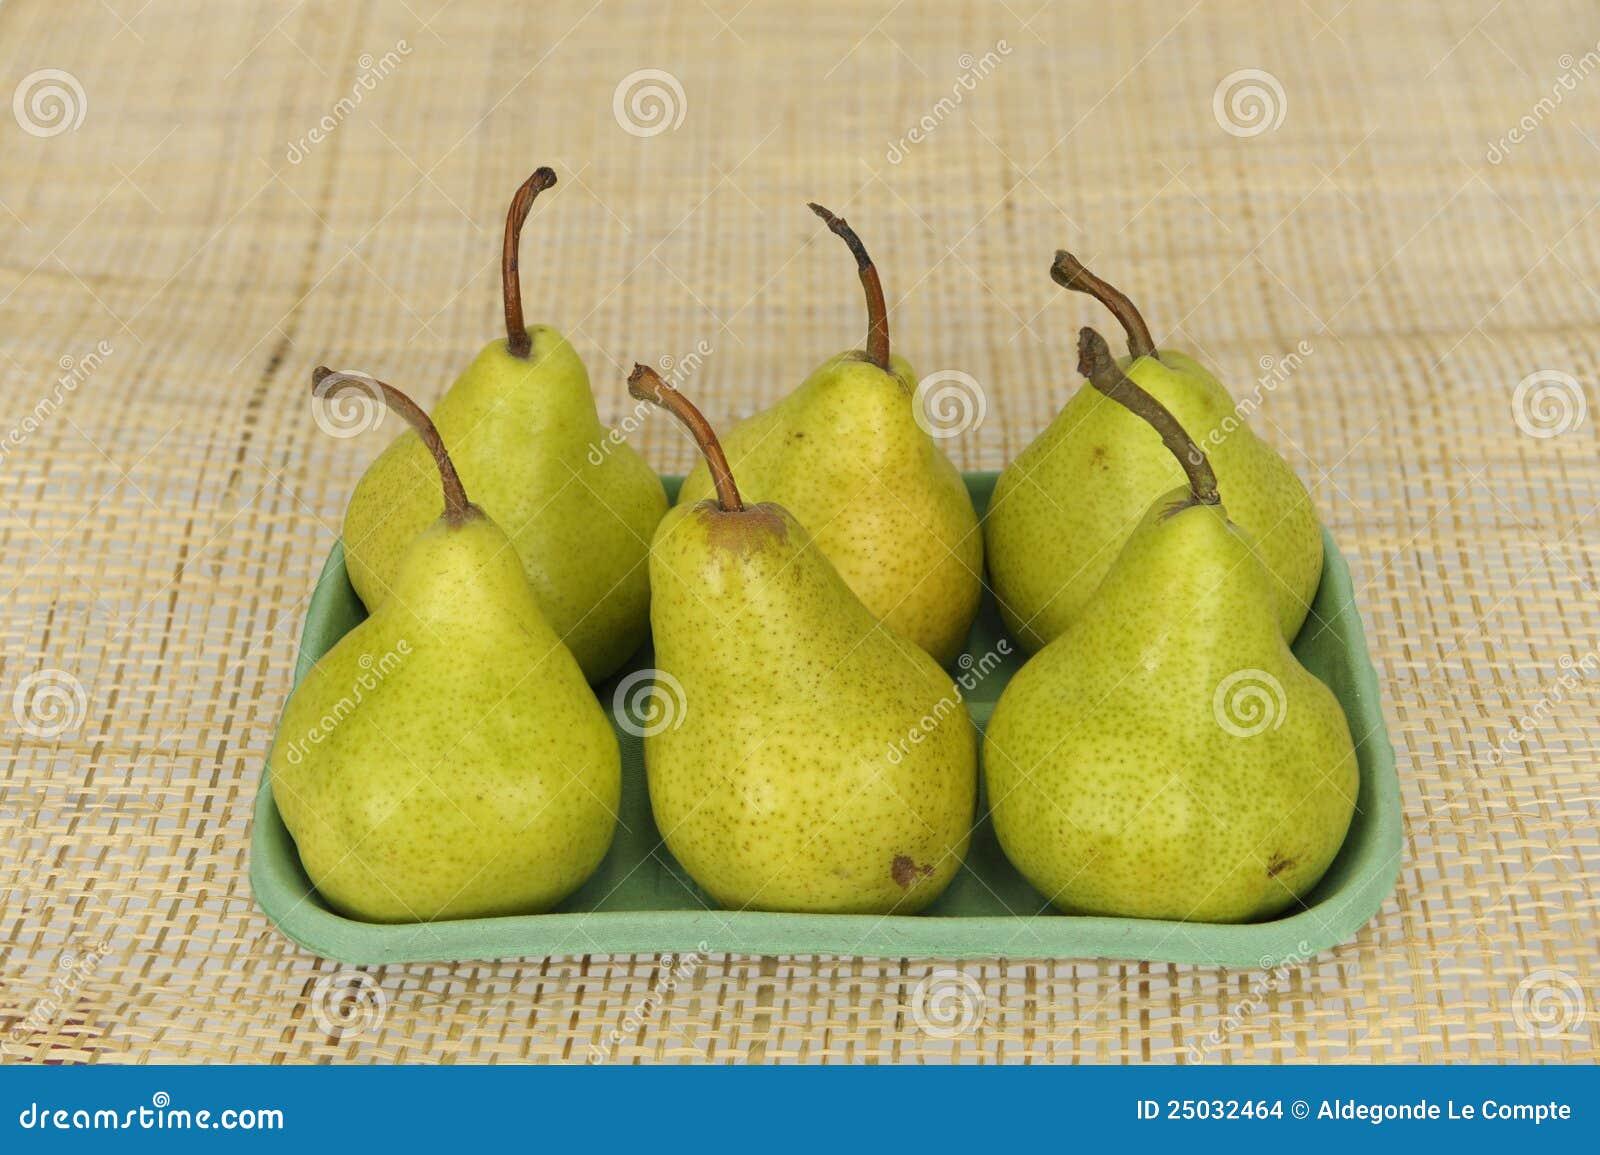 Pears sex